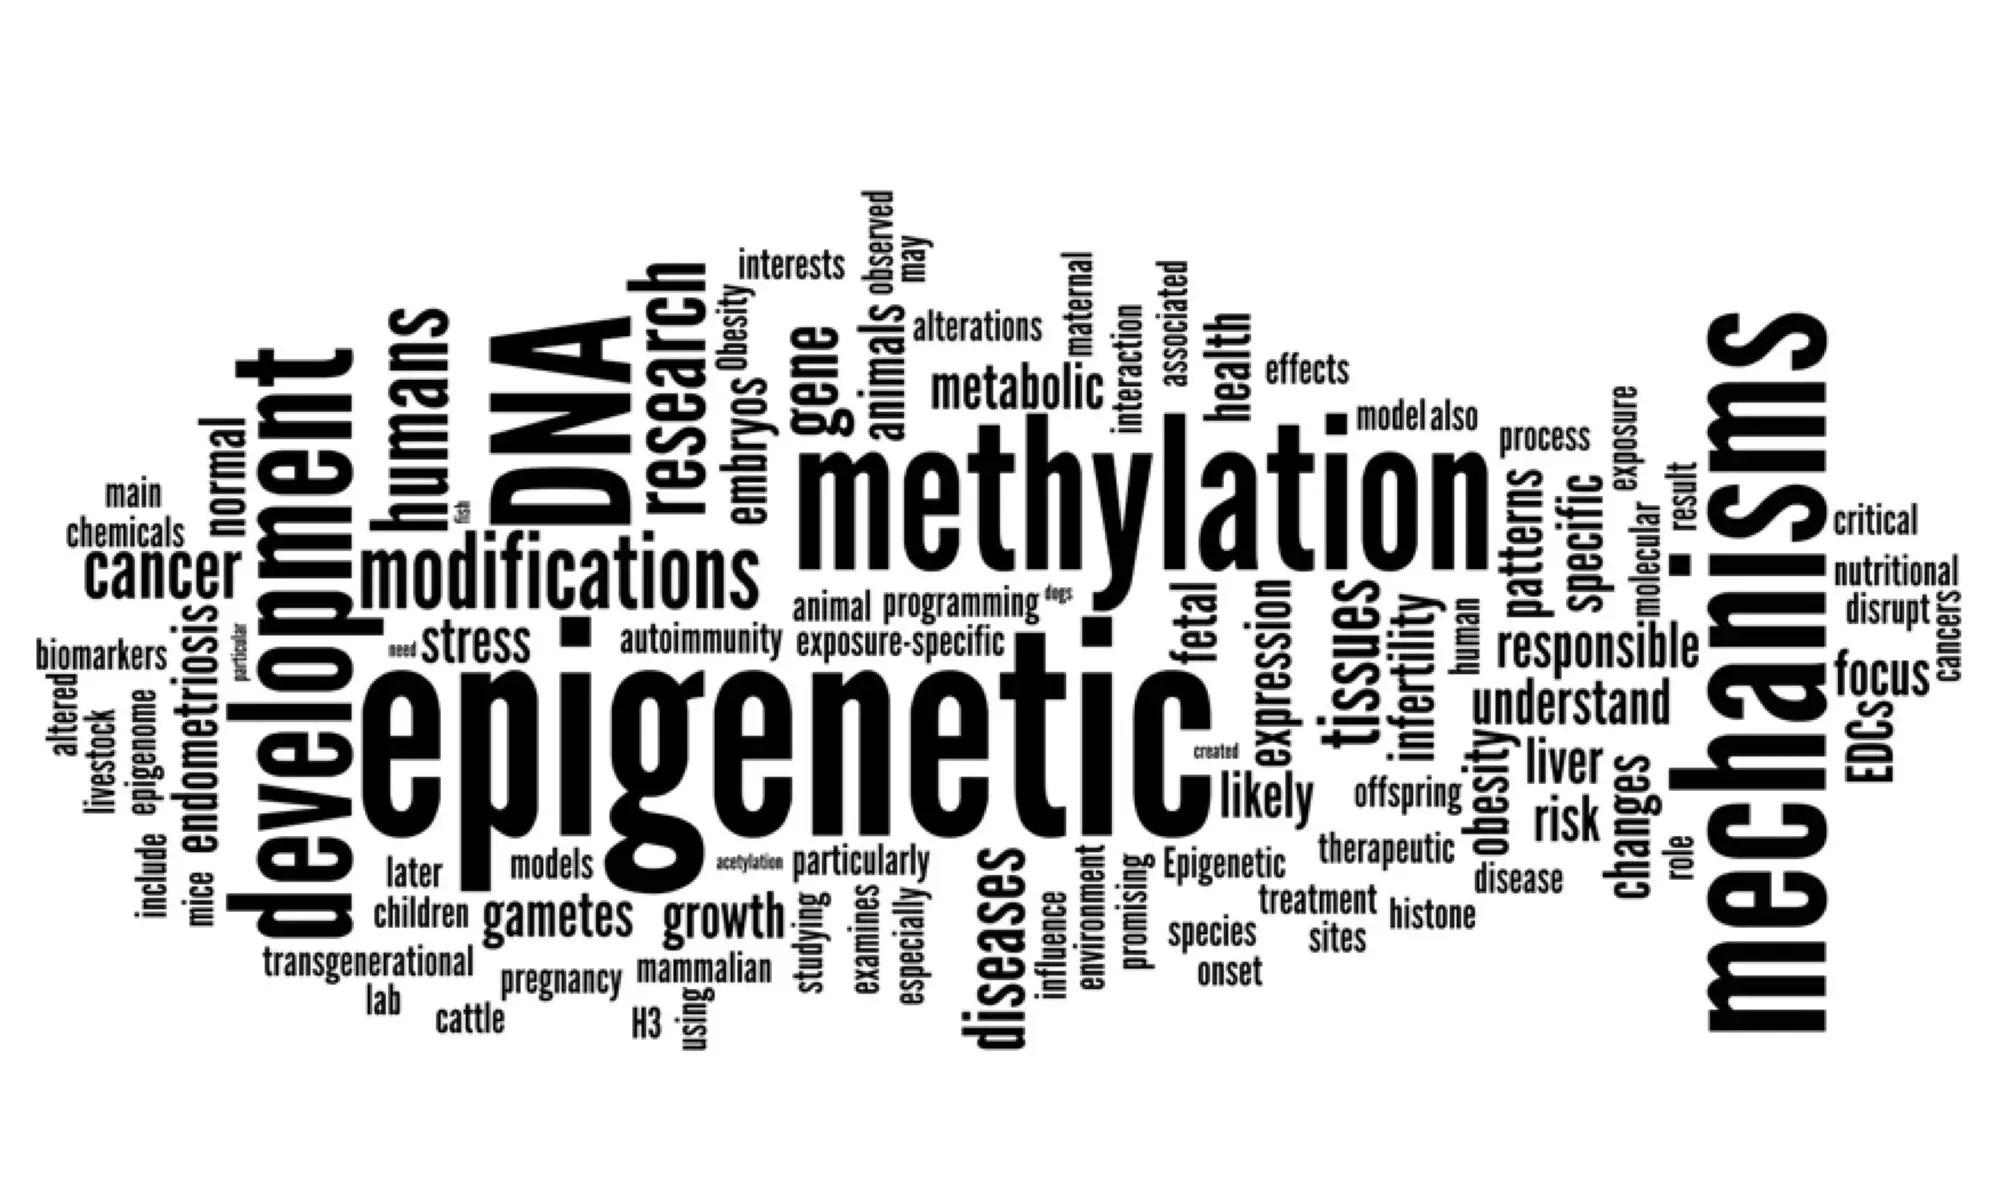 human epigenetics poster